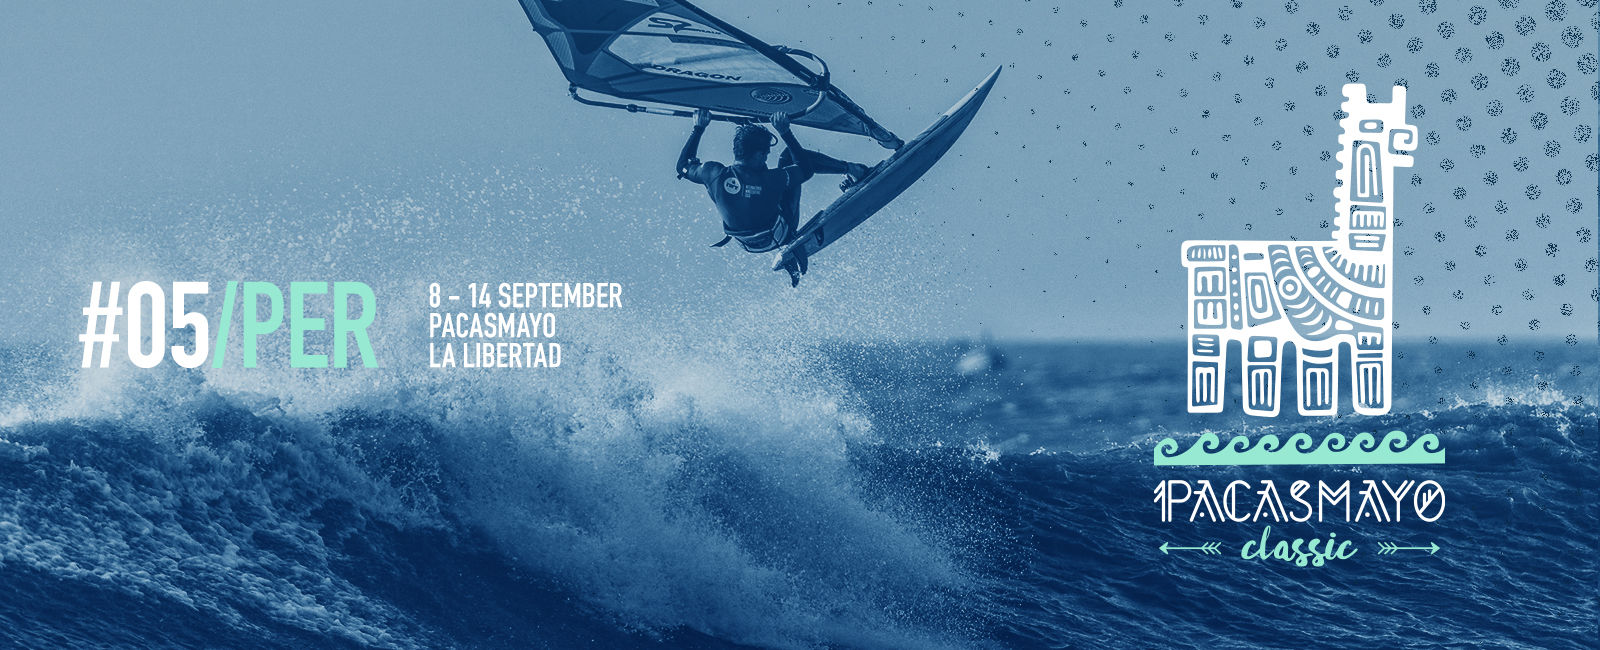 Home - International Windsurfing Tour-Inspiring the Future